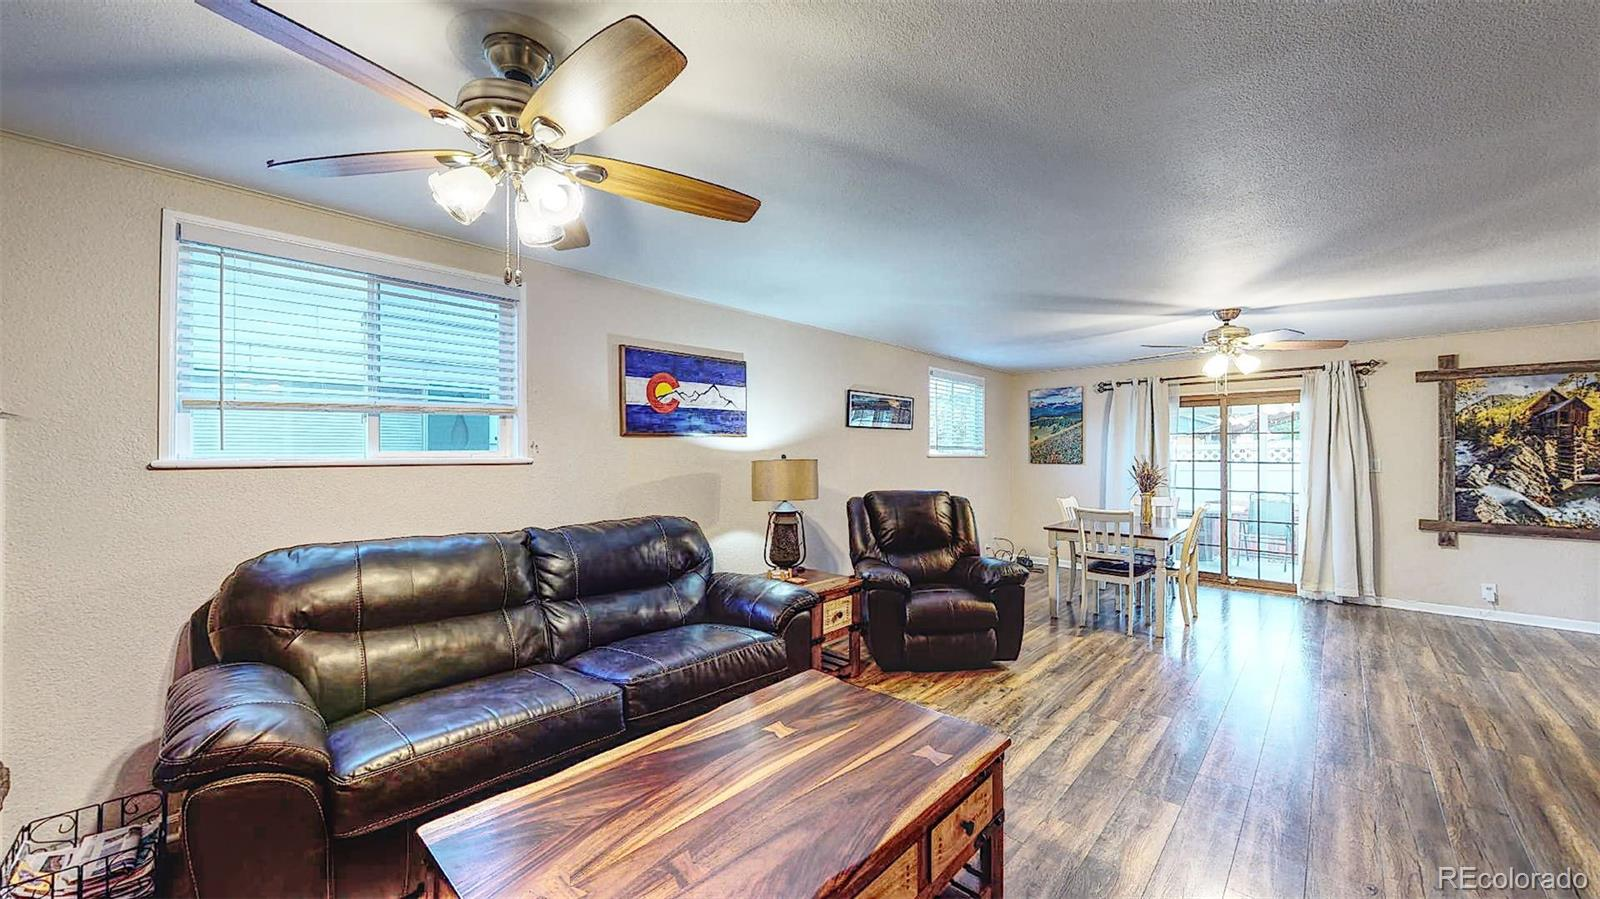 MLS# 6167151 - 16 - 1760 S Upham Street, Lakewood, CO 80232